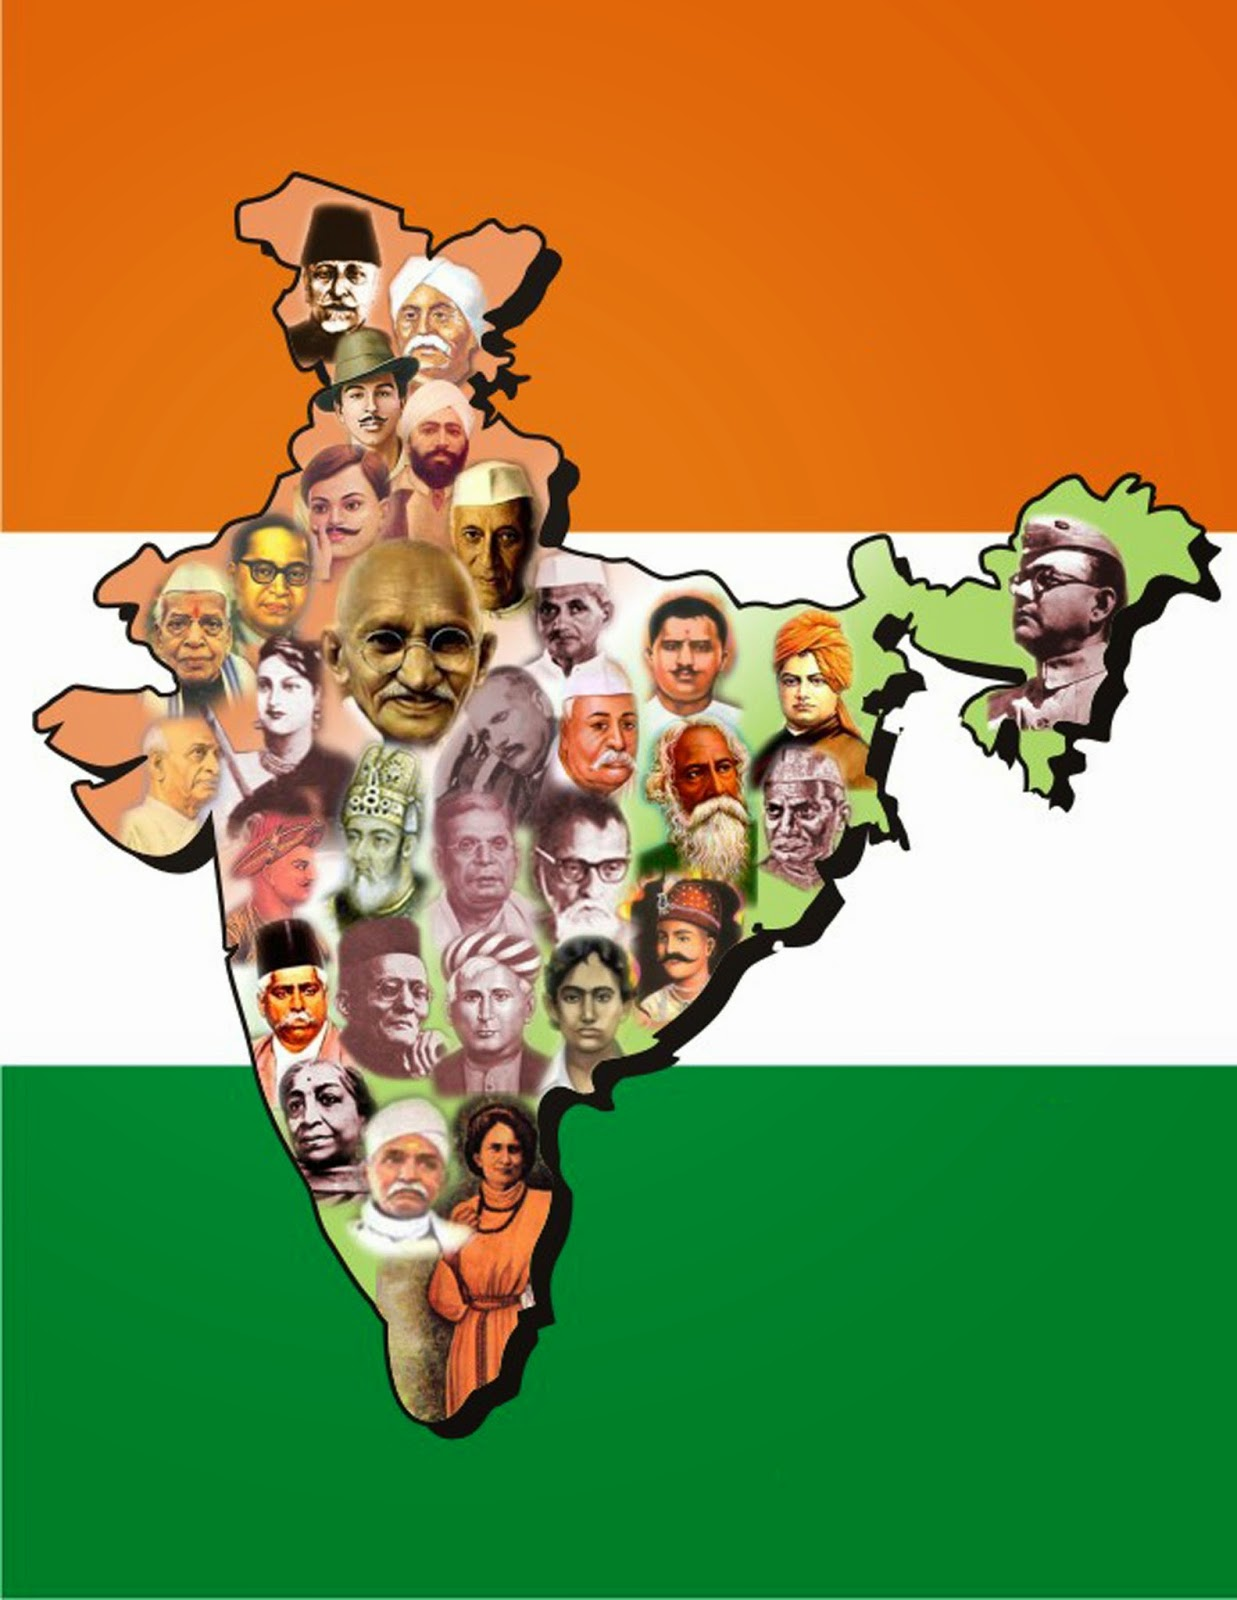 clip arts and images of india bharat mata